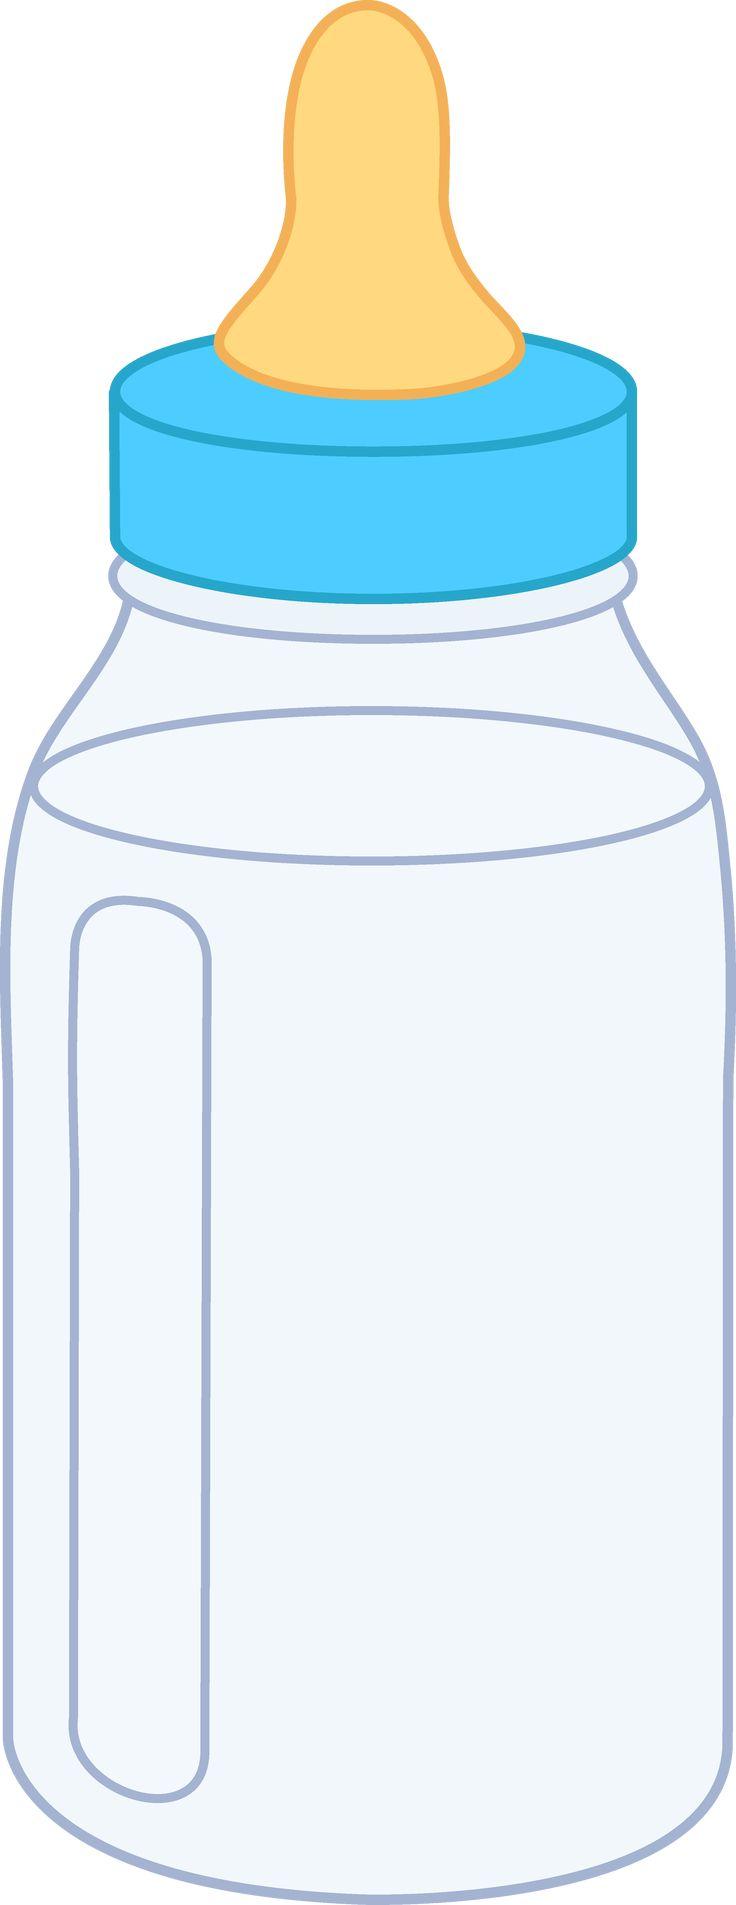 clipart baby bottle - photo #10